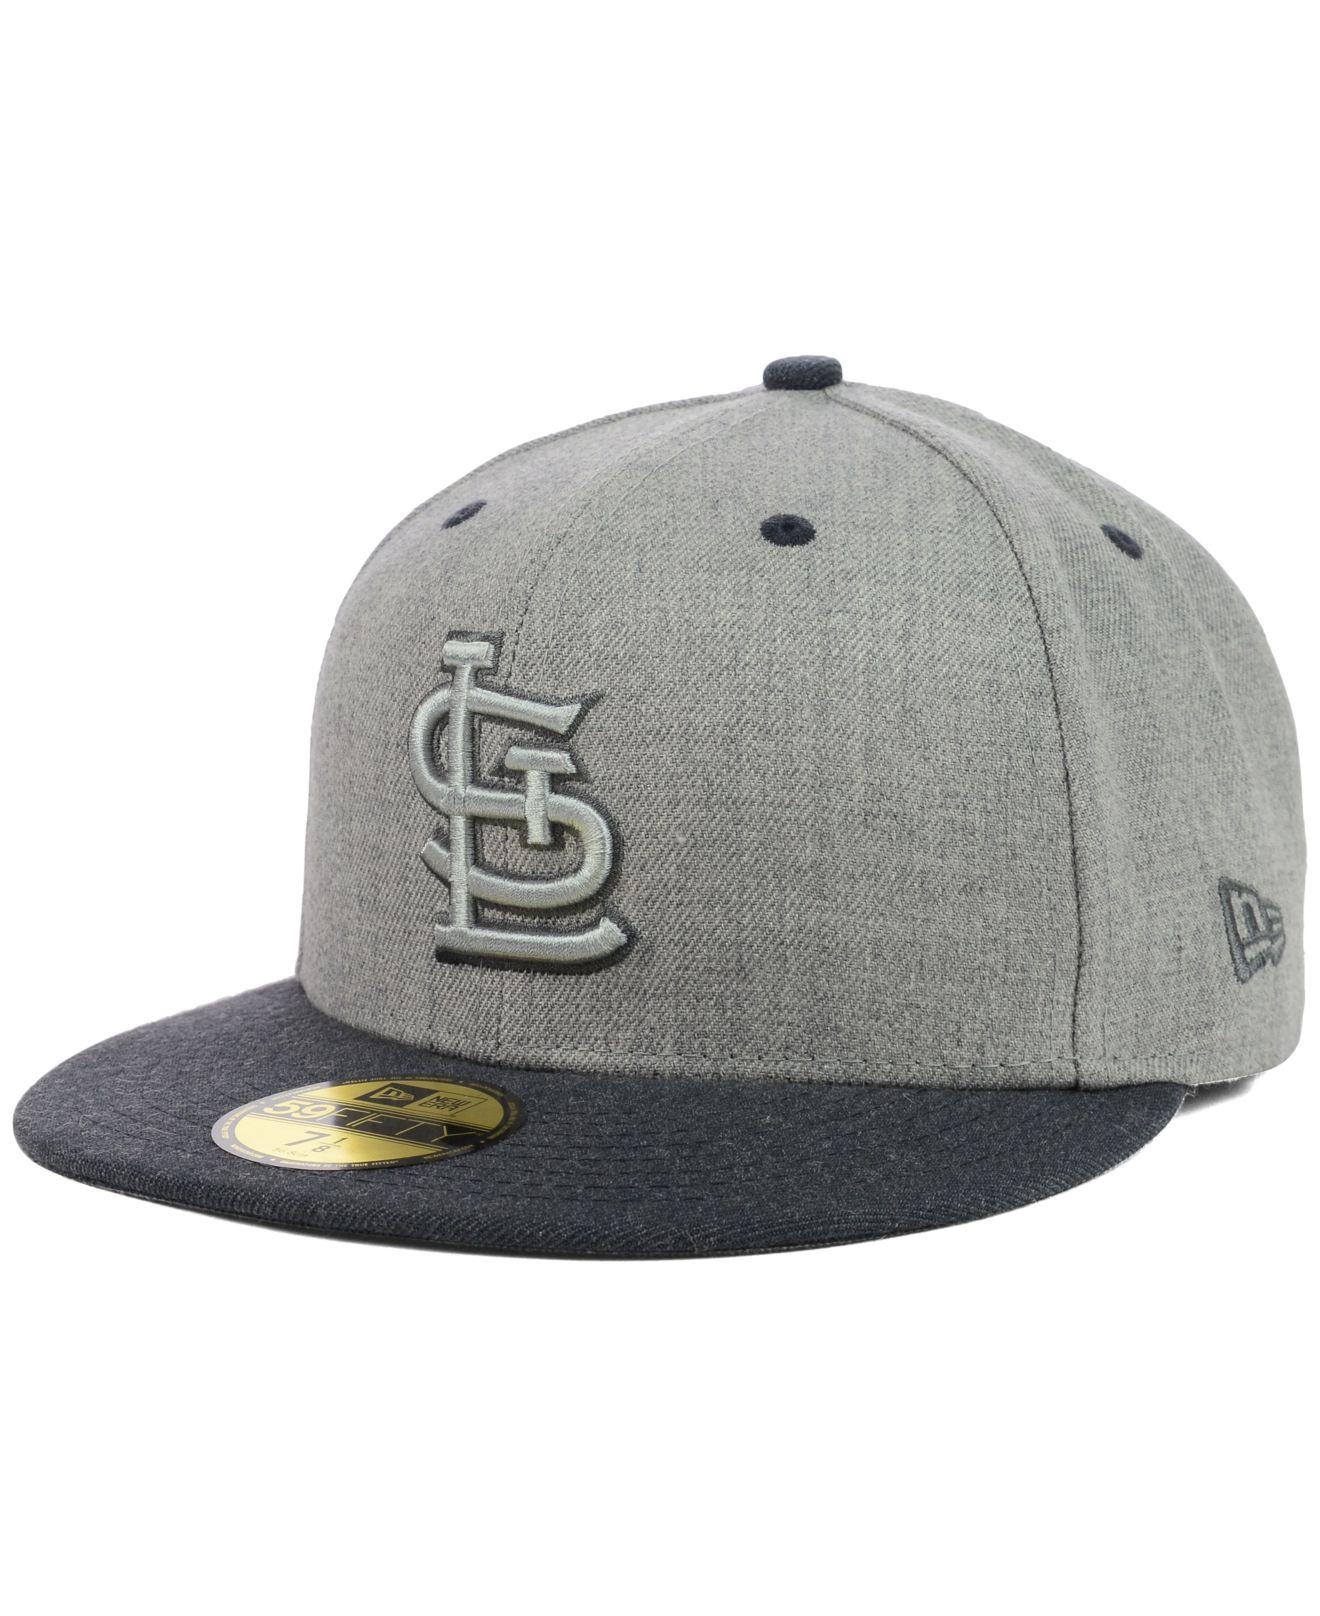 buy popular b3849 e7d7c KTZ St. Louis Cardinals Heather Mashup 59Fifty Cap in Gray for Men ...